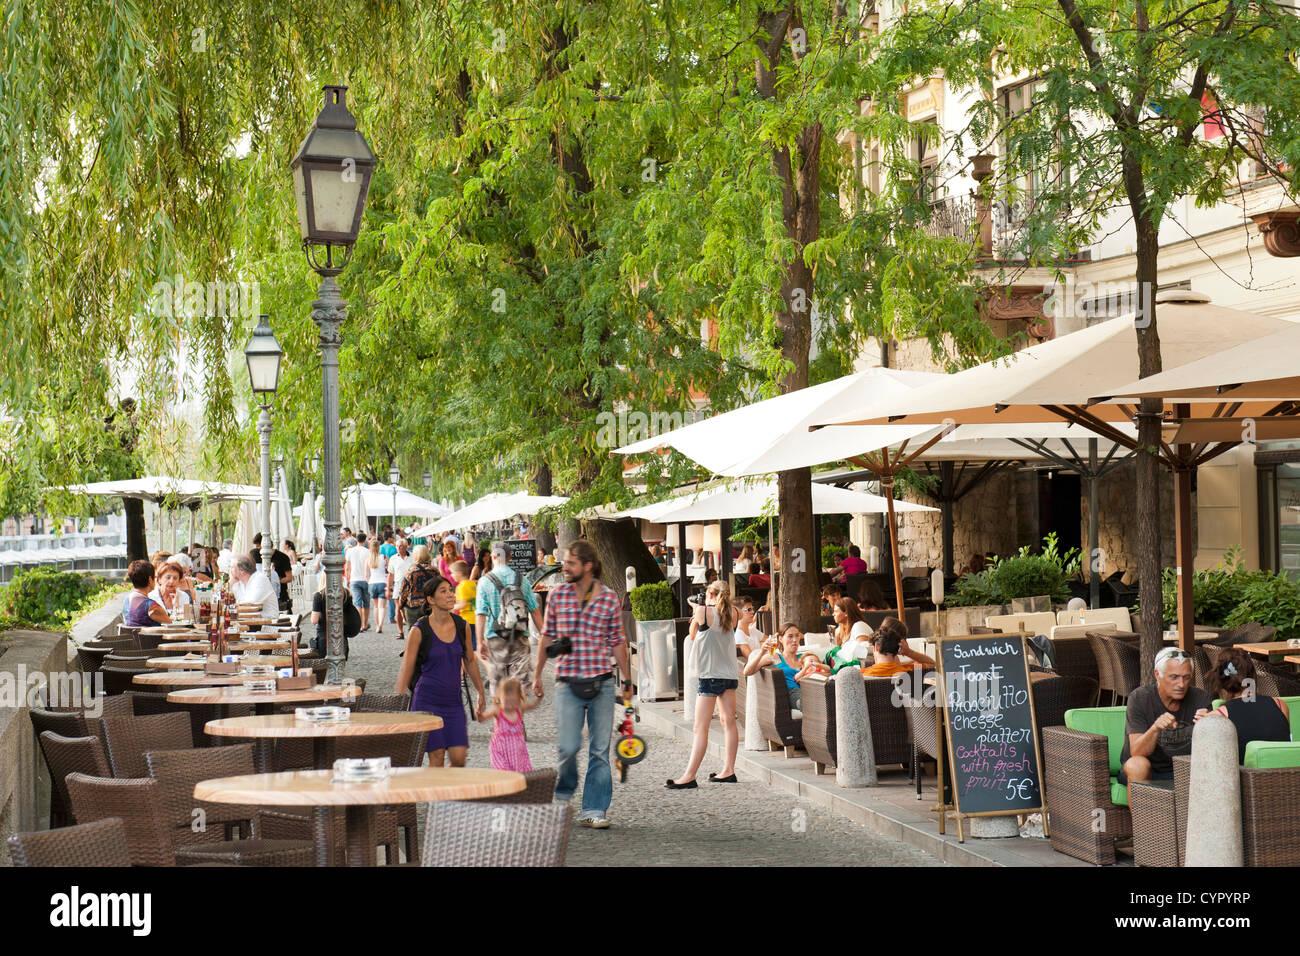 Sidewalk cafés on the banks of the Ljubljanica River in the old town in Ljubljana, the capital of Slovenia. - Stock Image